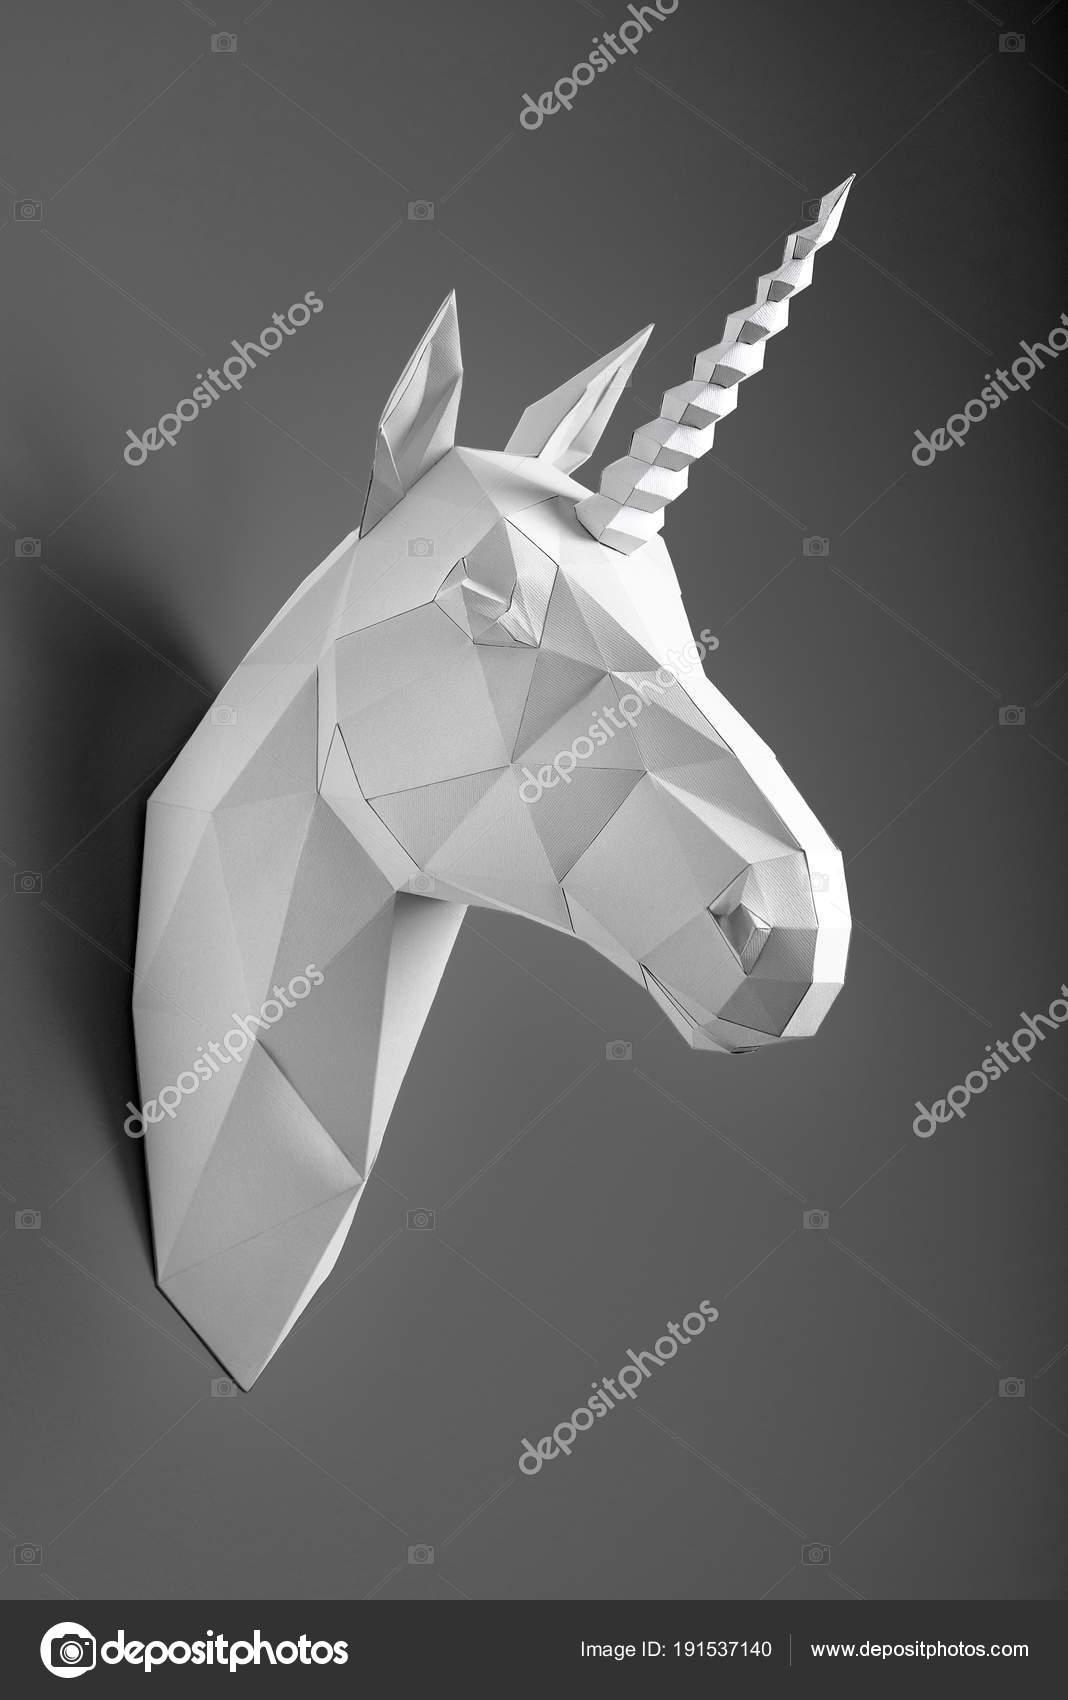 White Paper Unicorns Head Hanging On Dark Graphitic Shadowed Wall Stock Photo